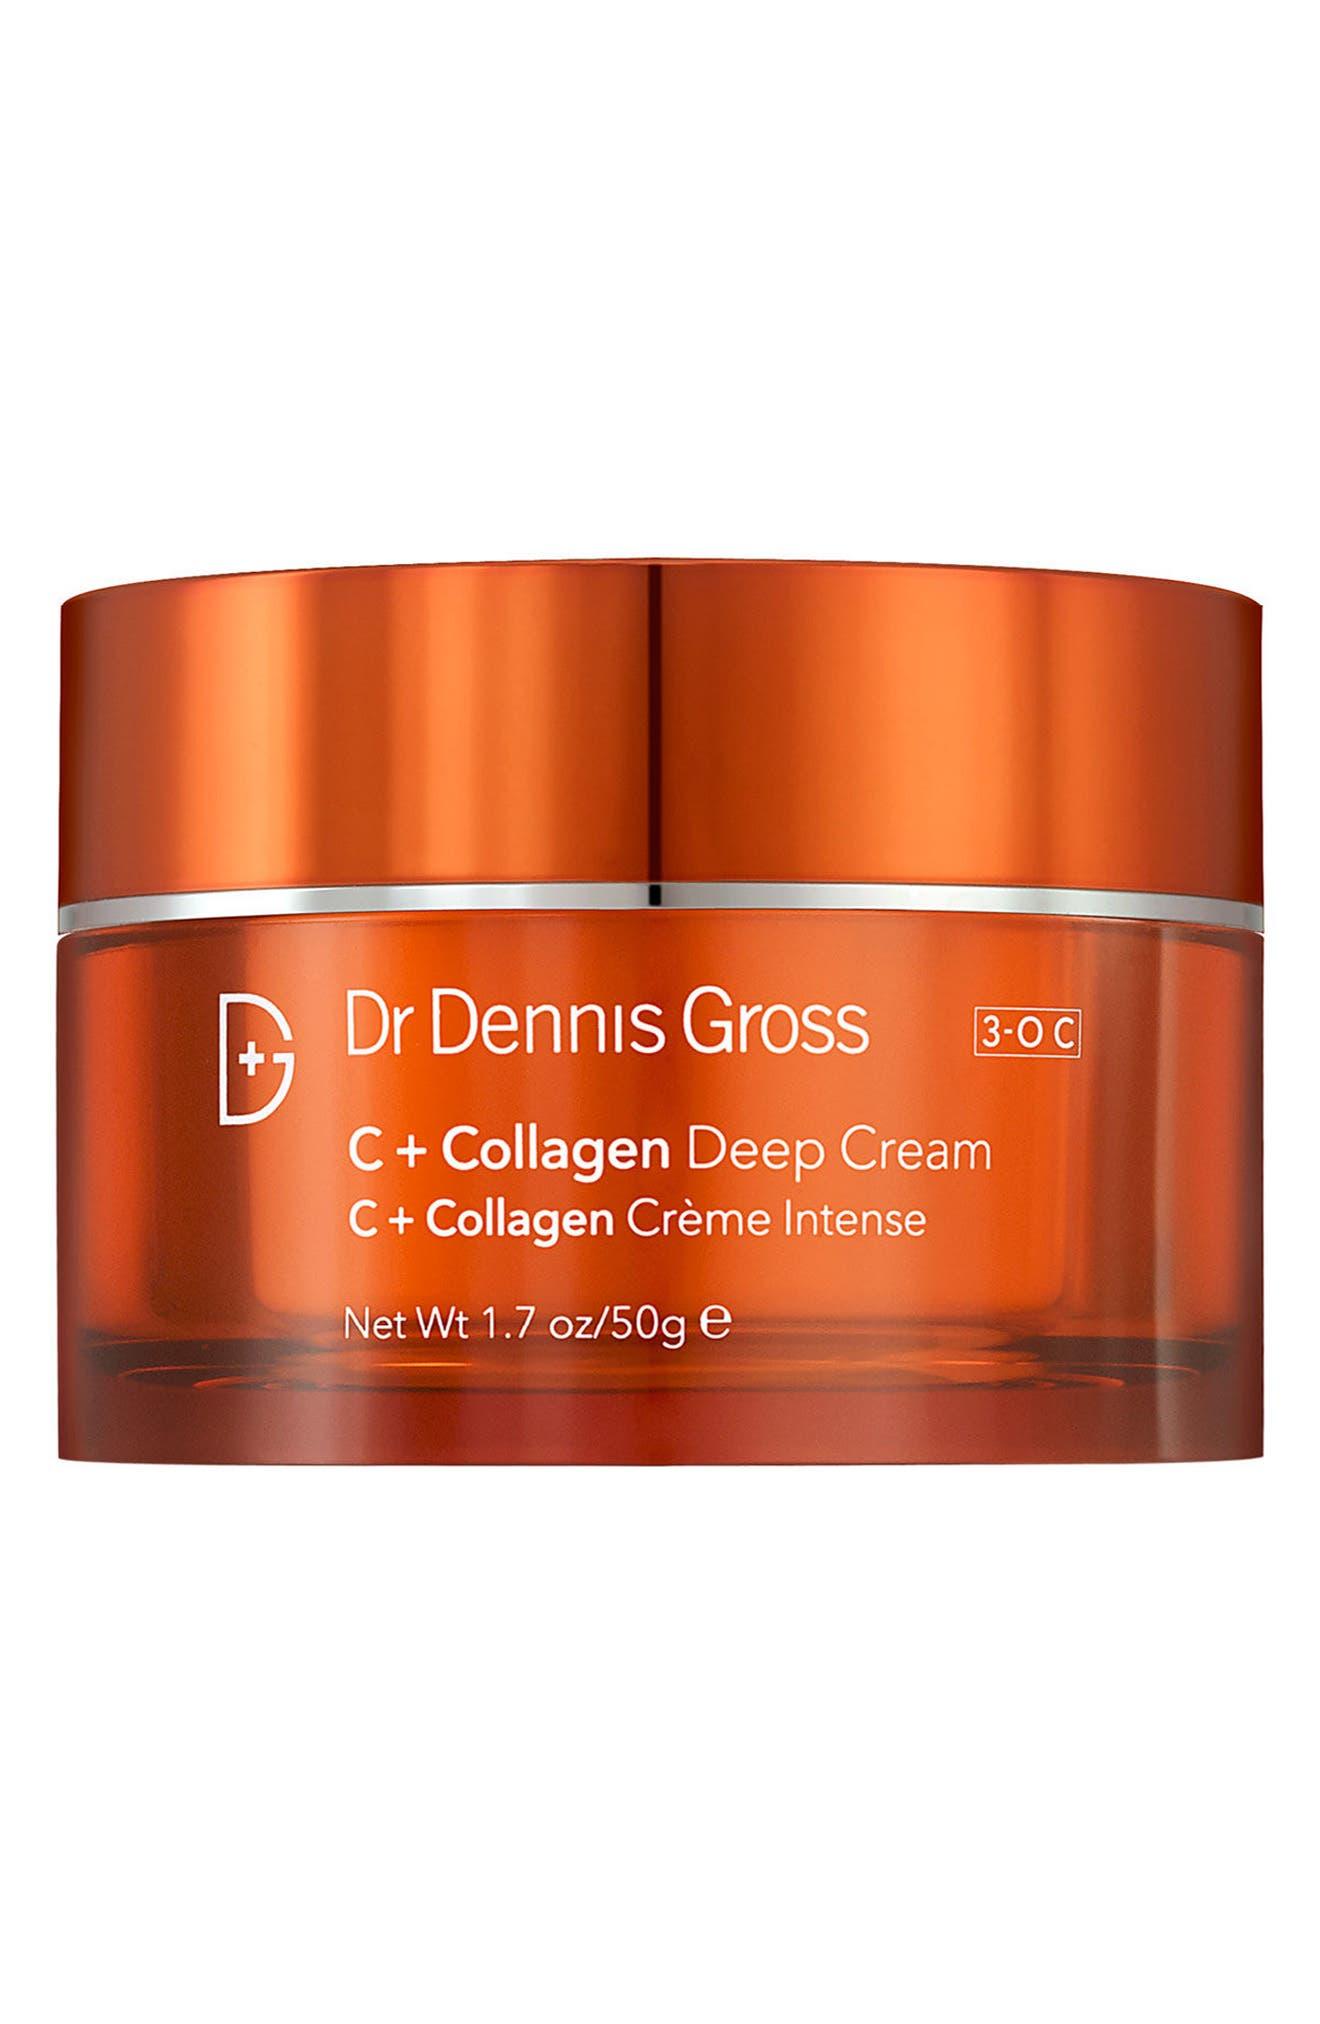 Dr. Dennis Gross Skincare C + Collagen Deep Cream (Nordstrom Exclusive)